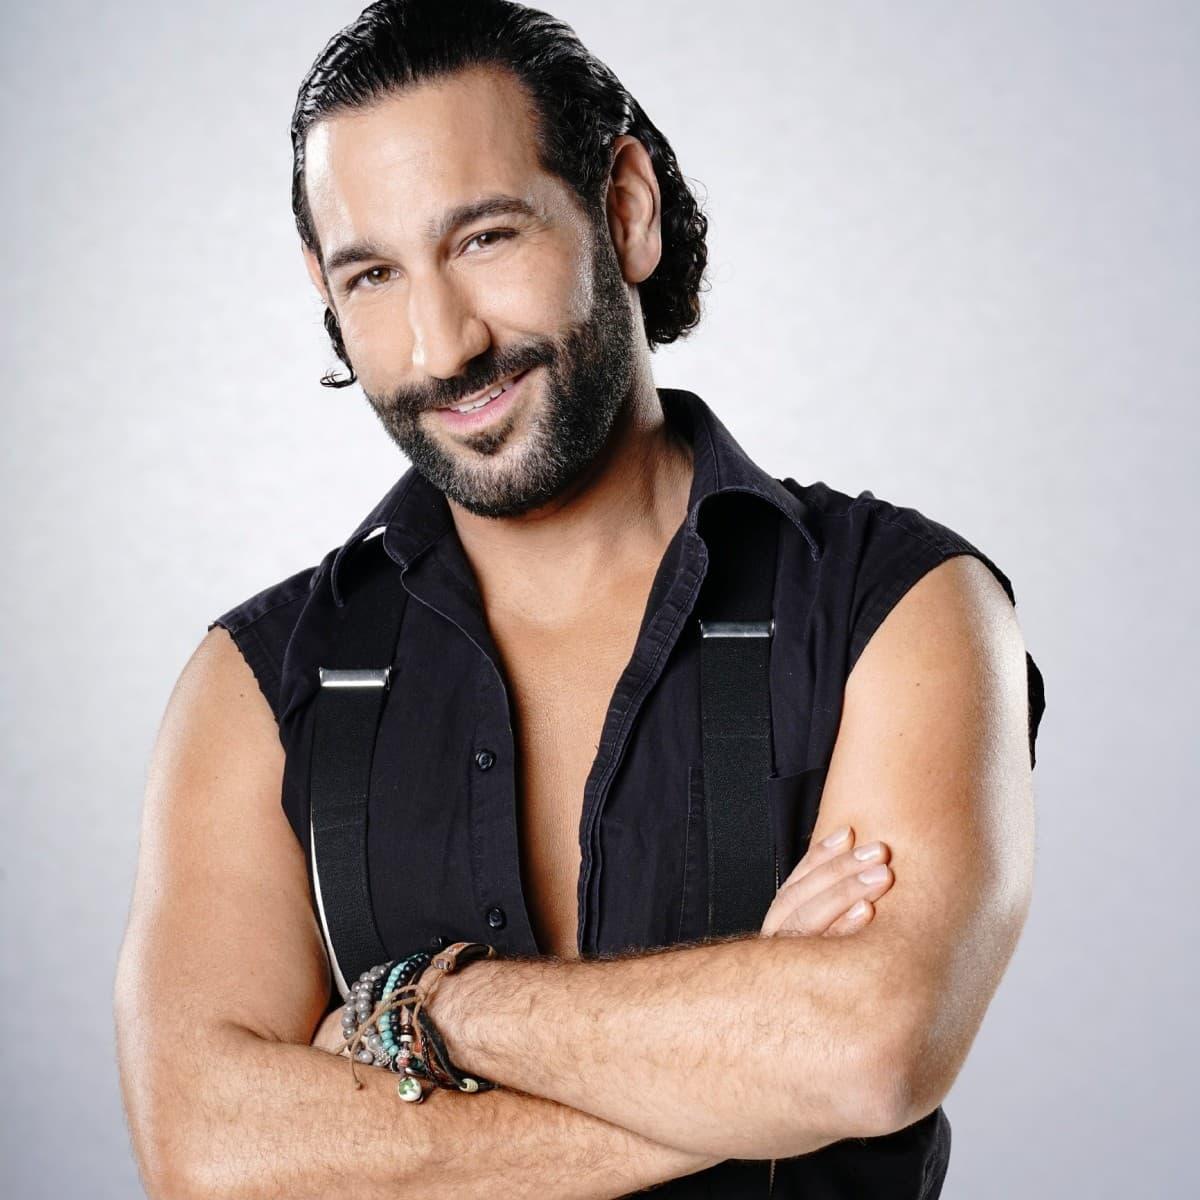 Massimo Sinato Profi-Tänzer bei Let's dance 2019